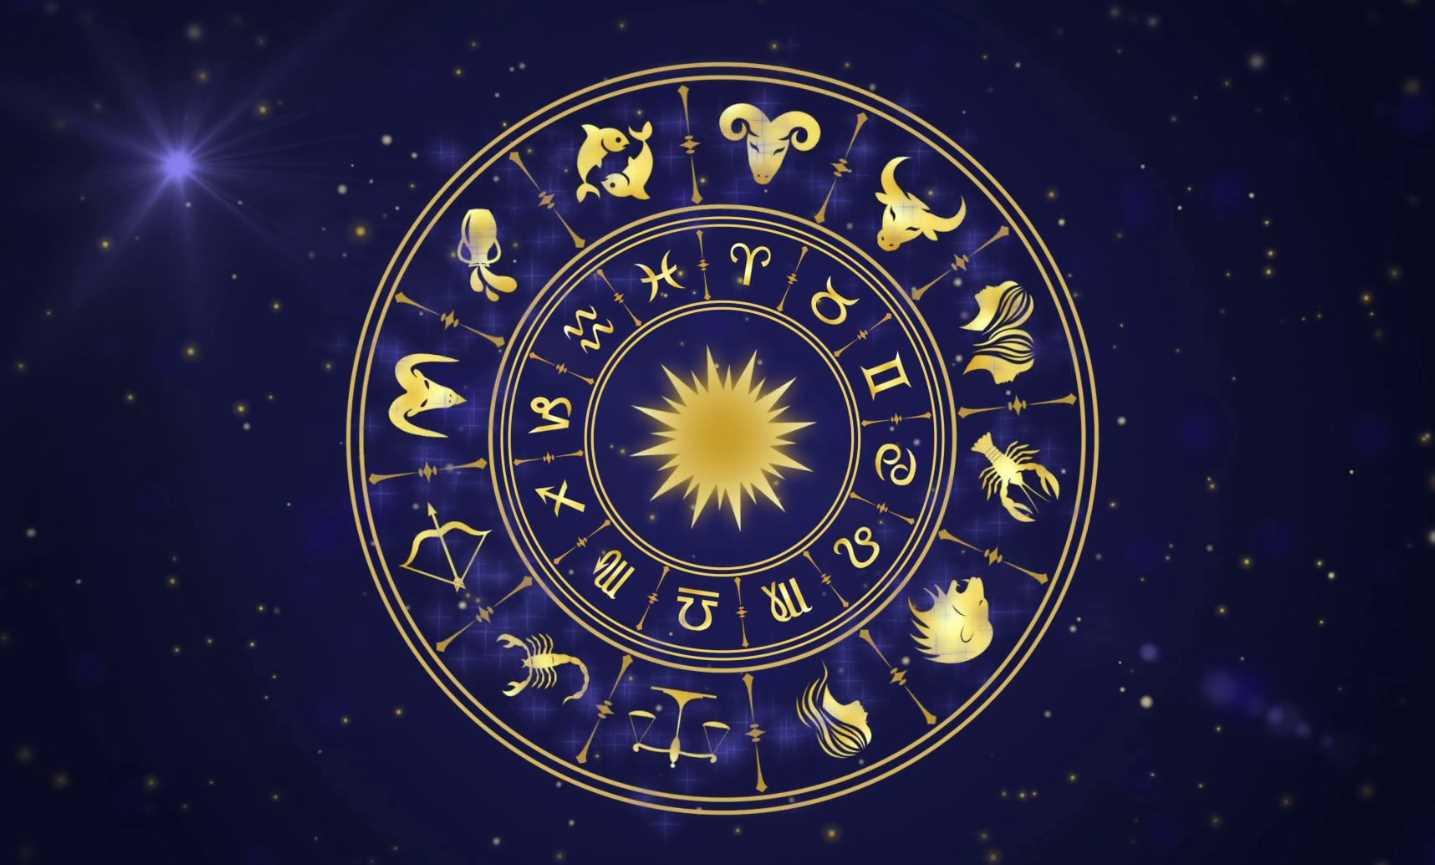 Horoscop ora 5: 28 mai 2021. Mare noroc pe plan financiar